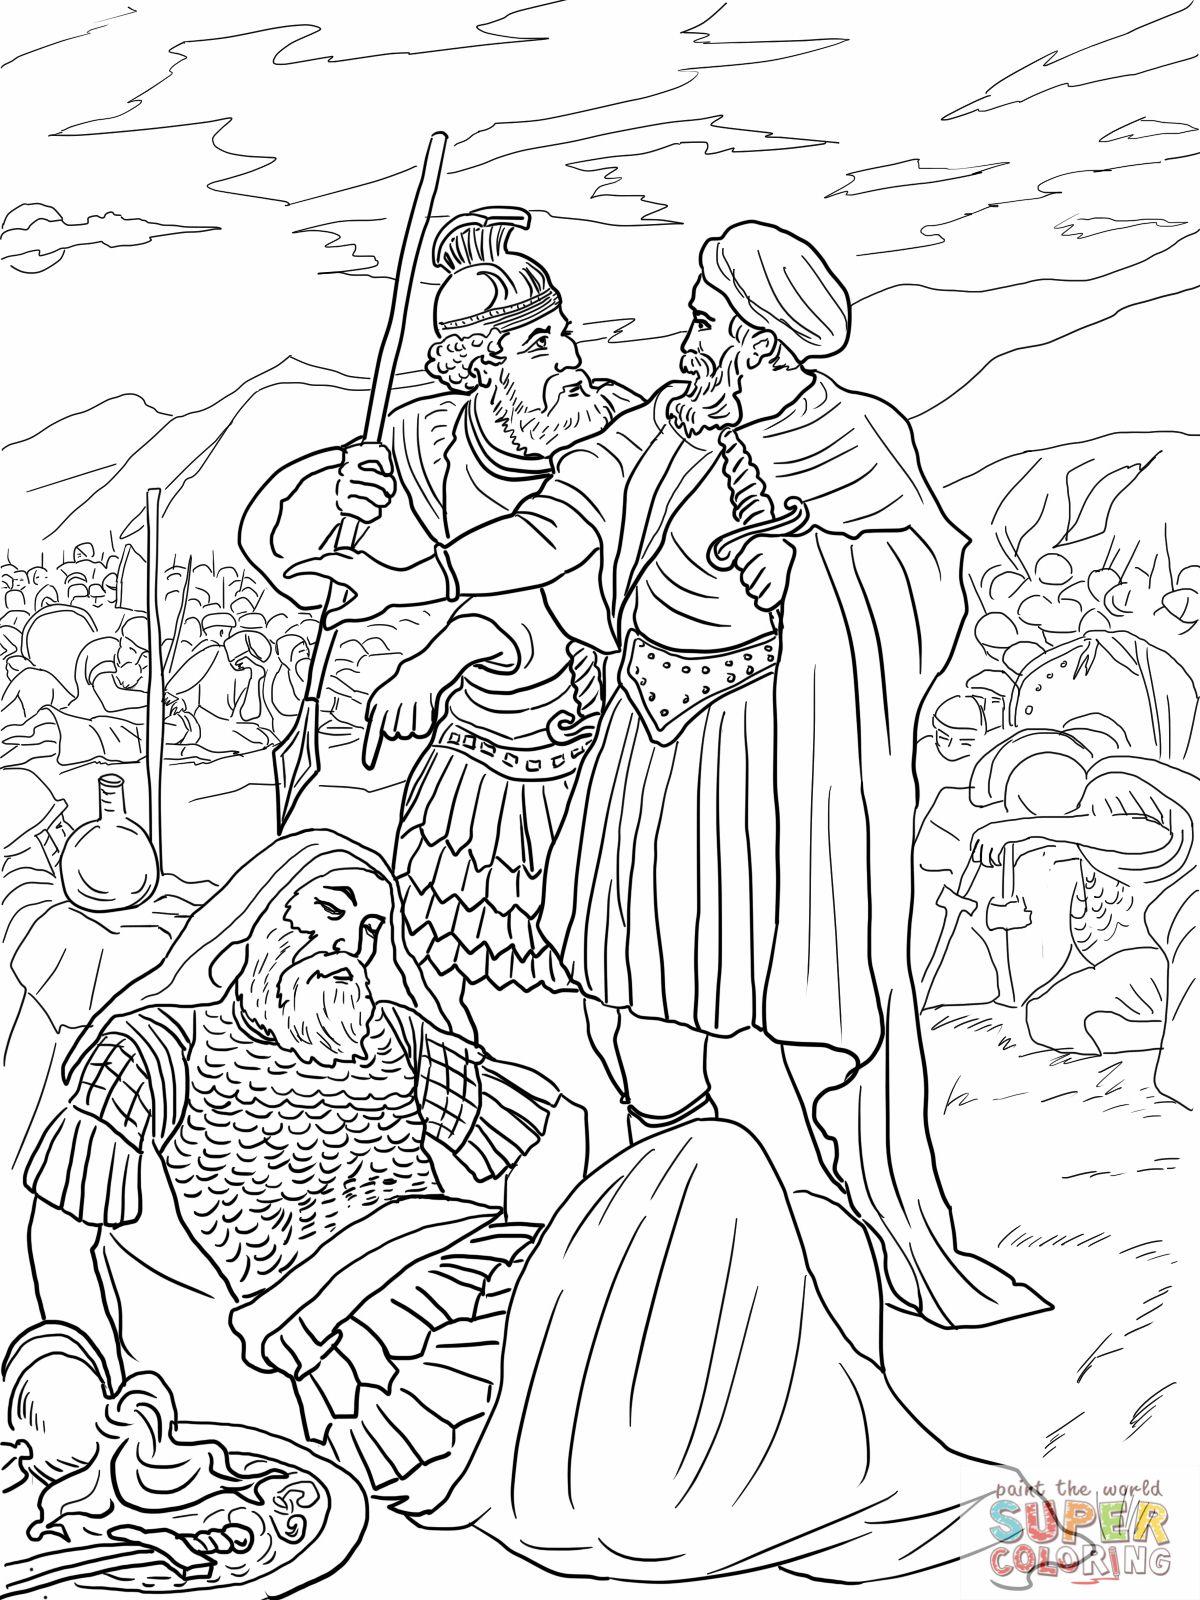 4-david-spares-king-saul-coloring-page.jpg (1200×1600